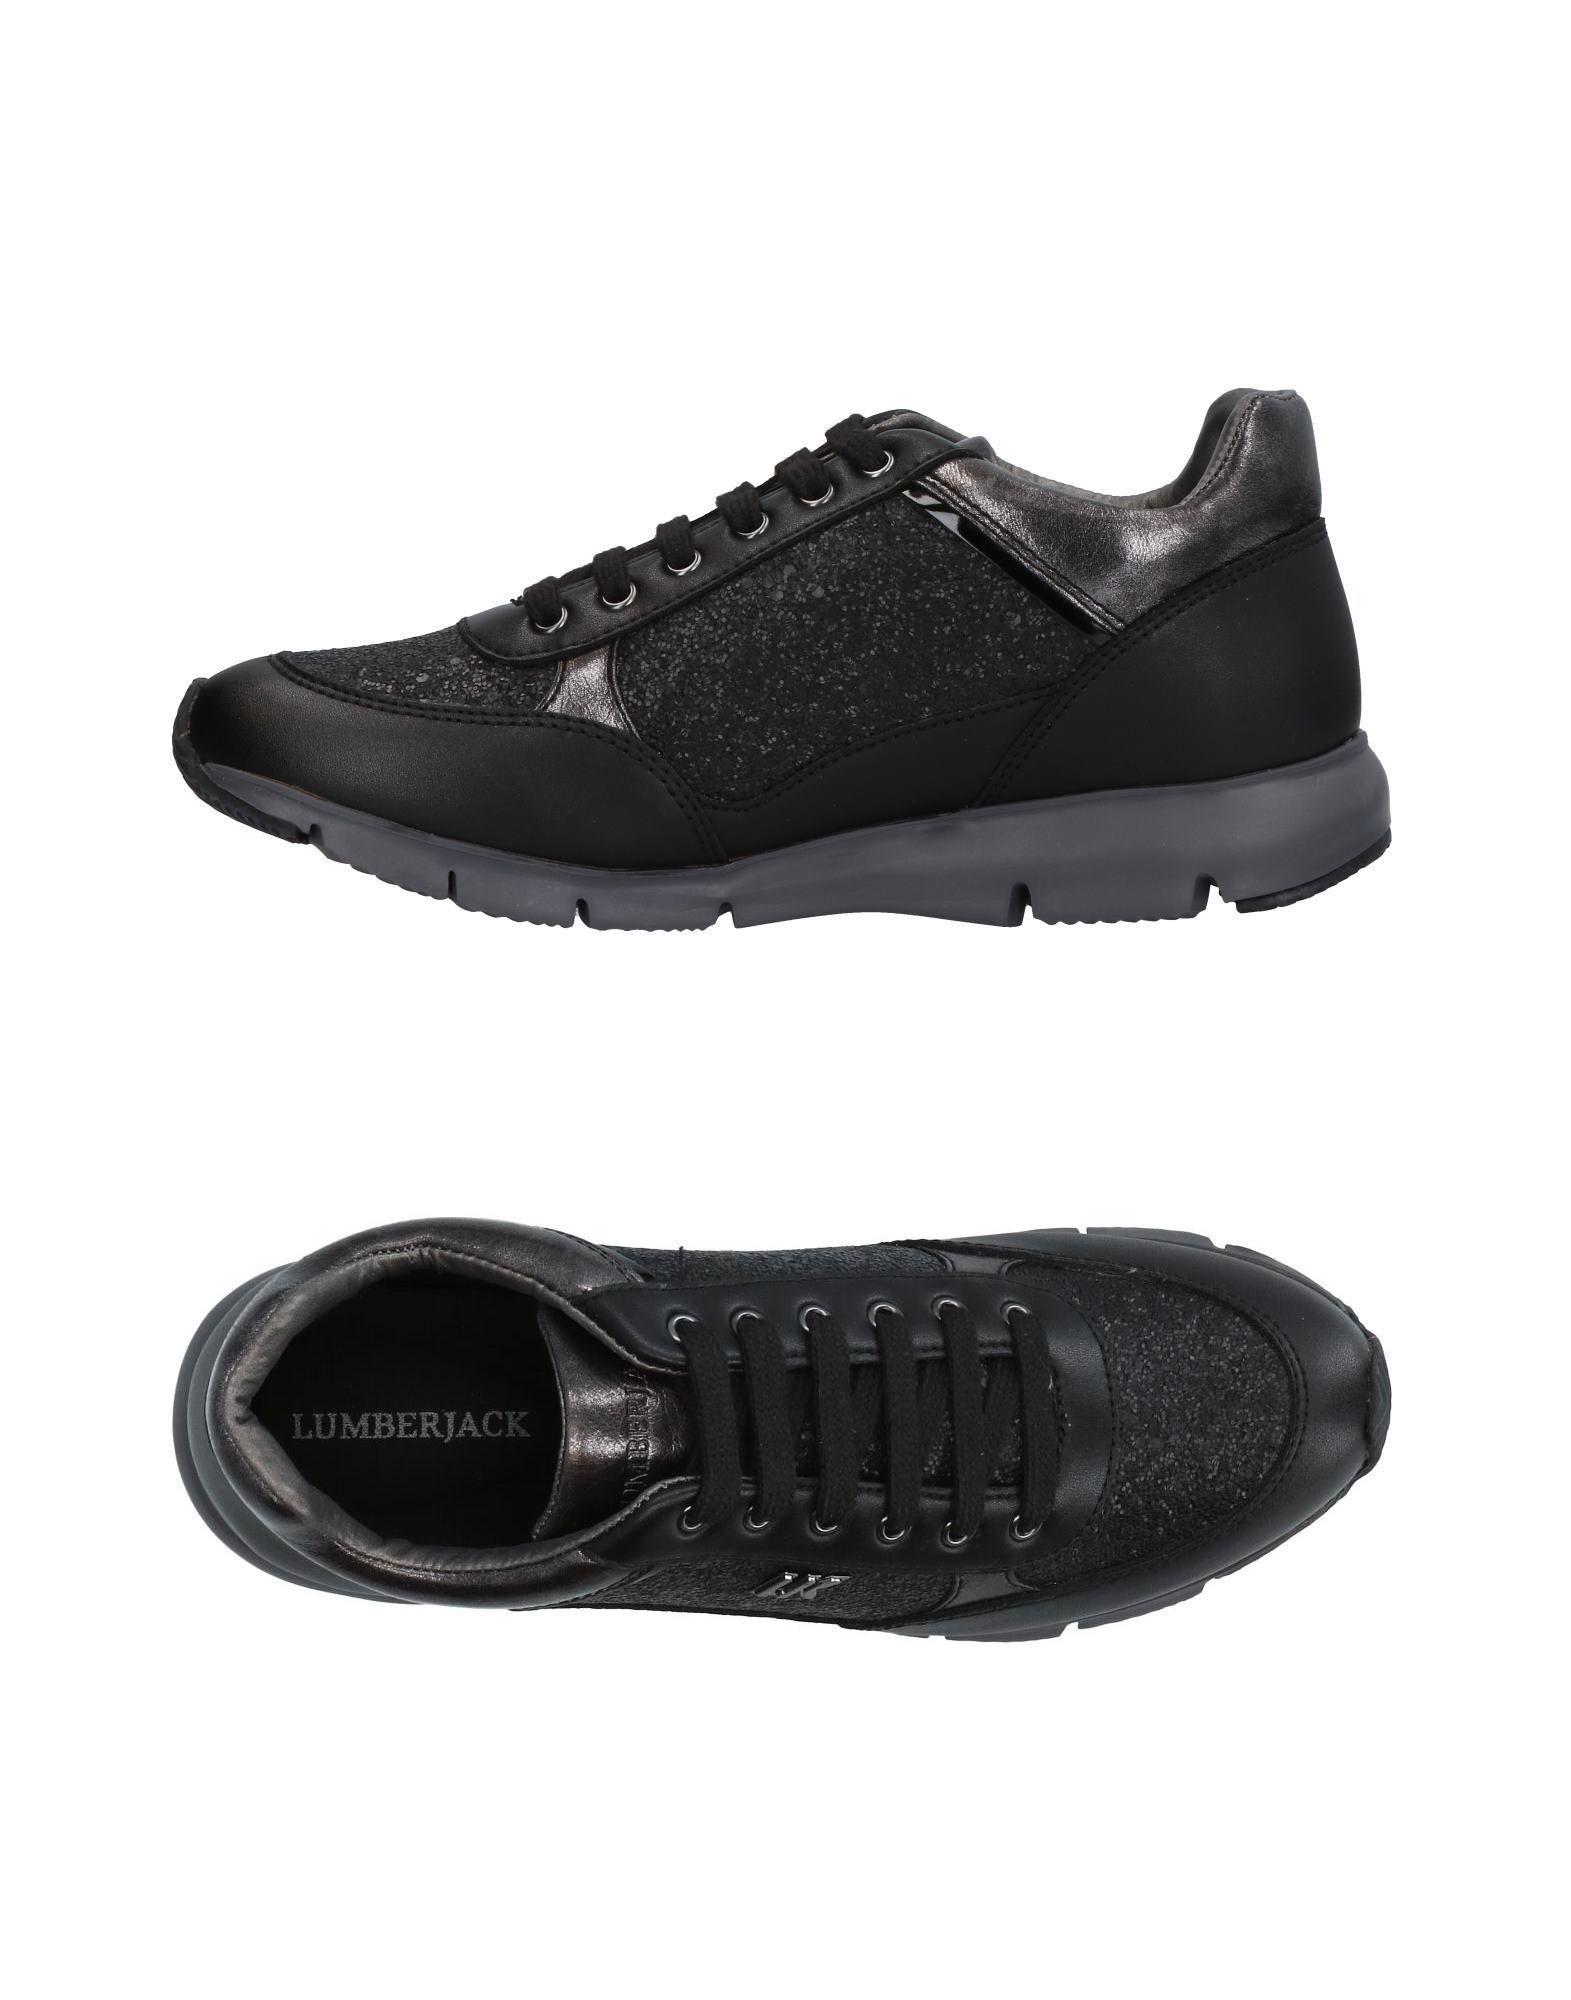 Baskets Lumberjack Femme - Baskets pas Lumberjack Noir Chaussures femme pas Baskets cher homme et femme 30cd8b